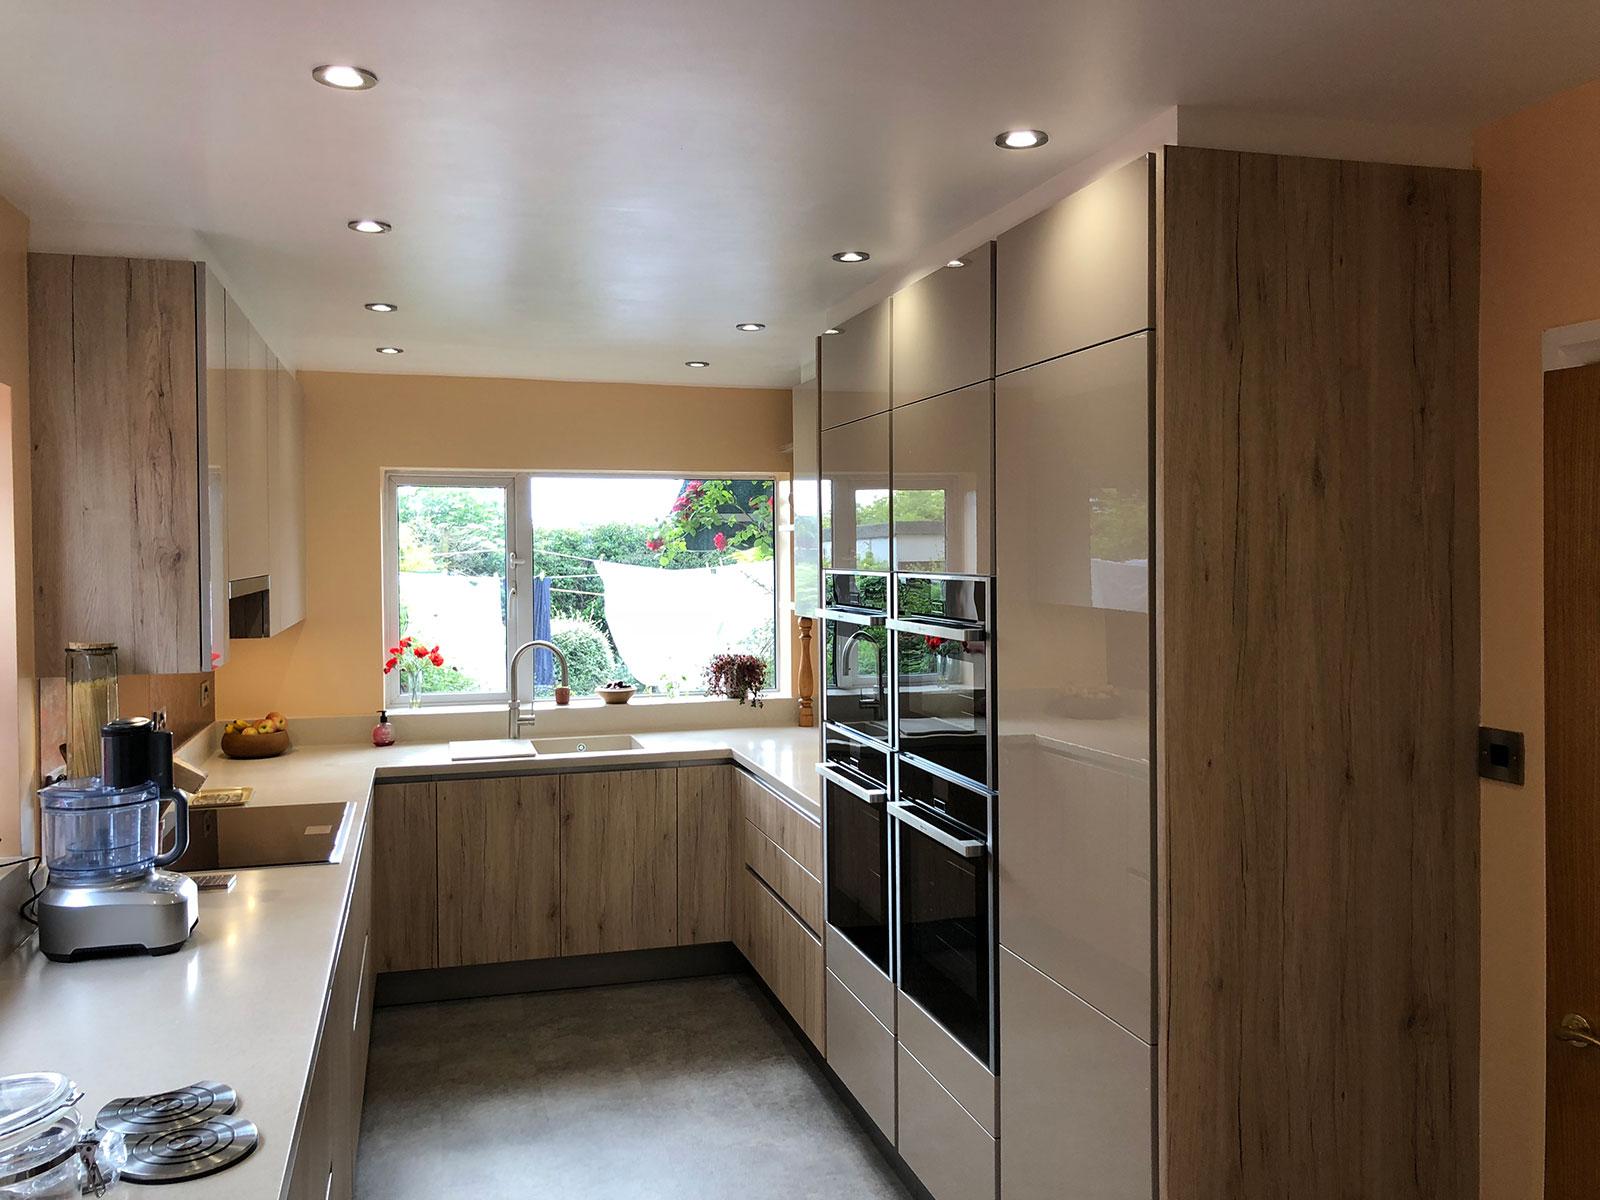 handless fitted kitchen Scholes 2